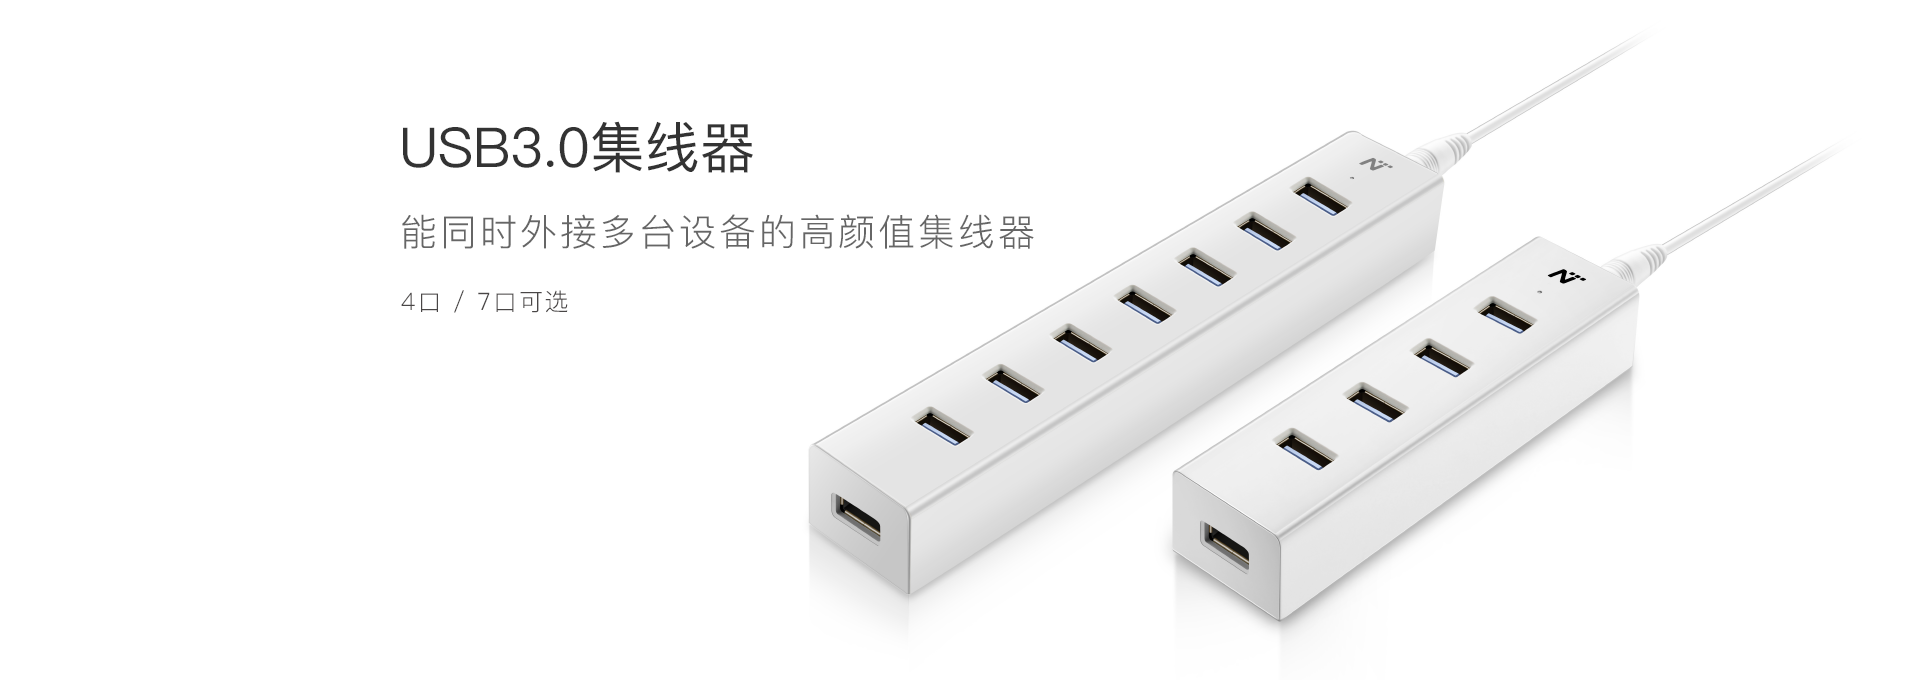 USB3.0集线器